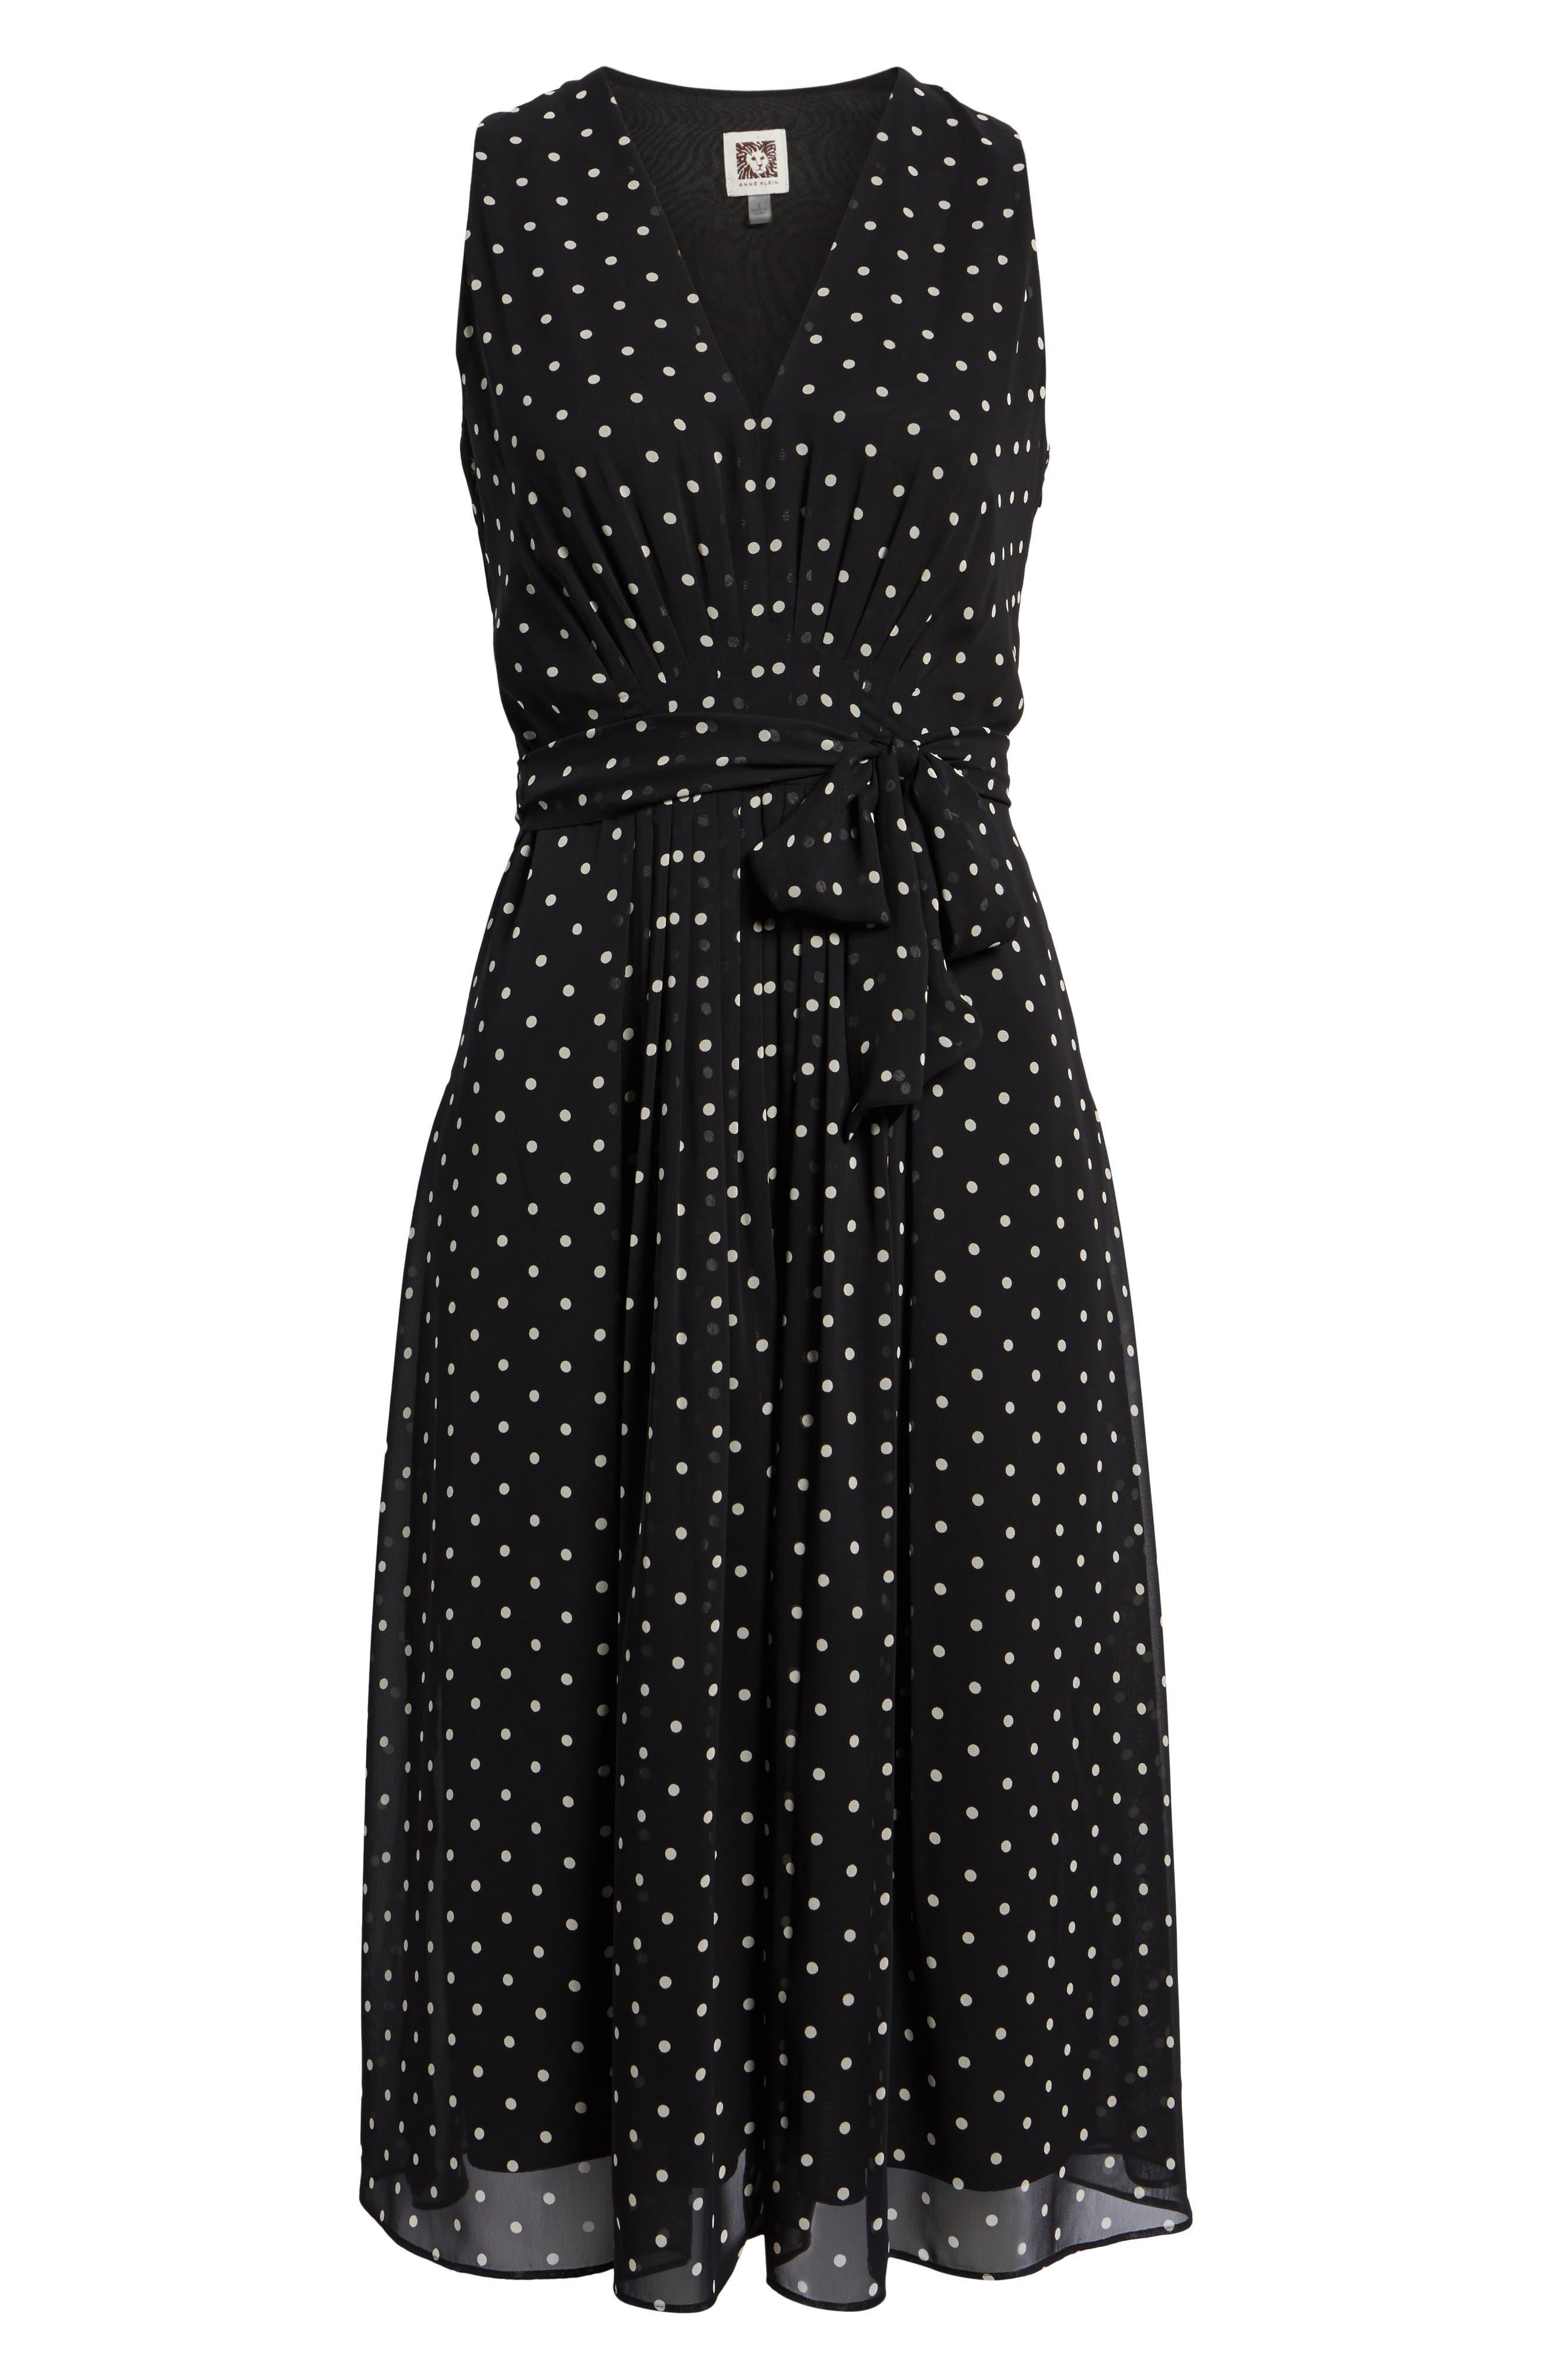 New York Dotted Chiffon Dress,                             Alternate thumbnail 6, color,                             Black/ White